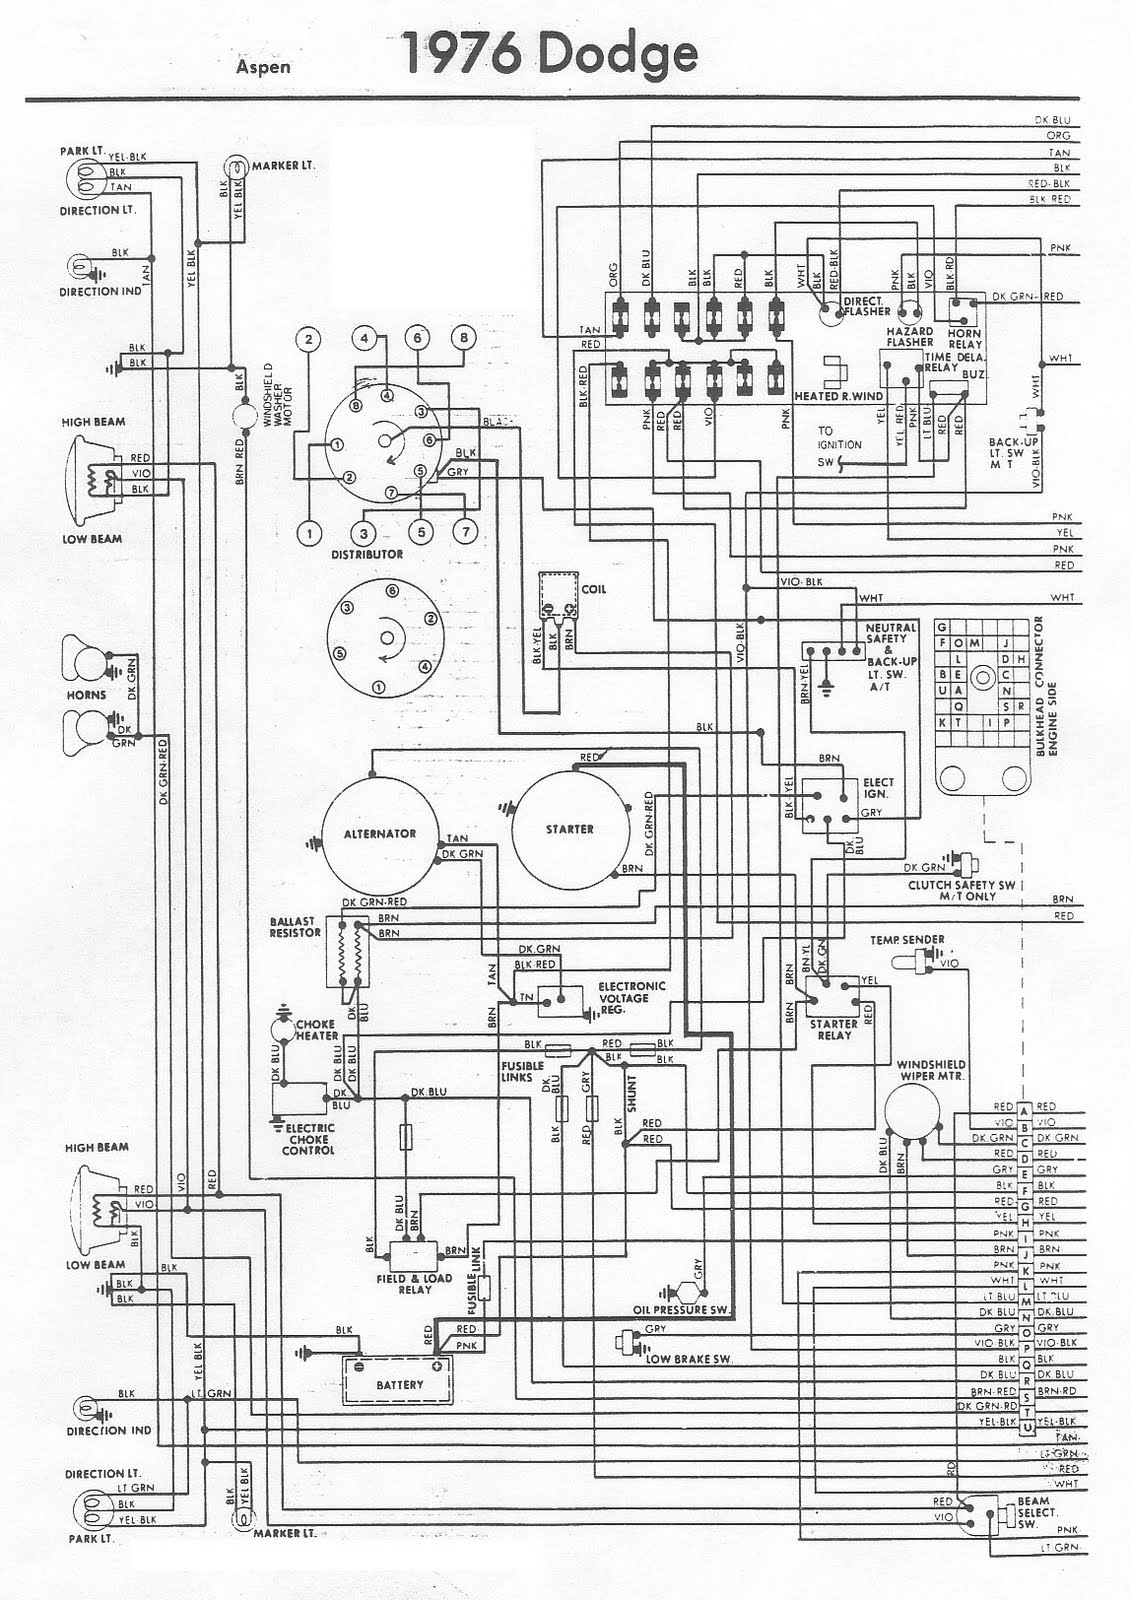 2001 Honda Civic Power Window Wiring Diagram Split Ac In Hindi Free Auto Diagram: 1976 Dodge Aspen Engine Compartment